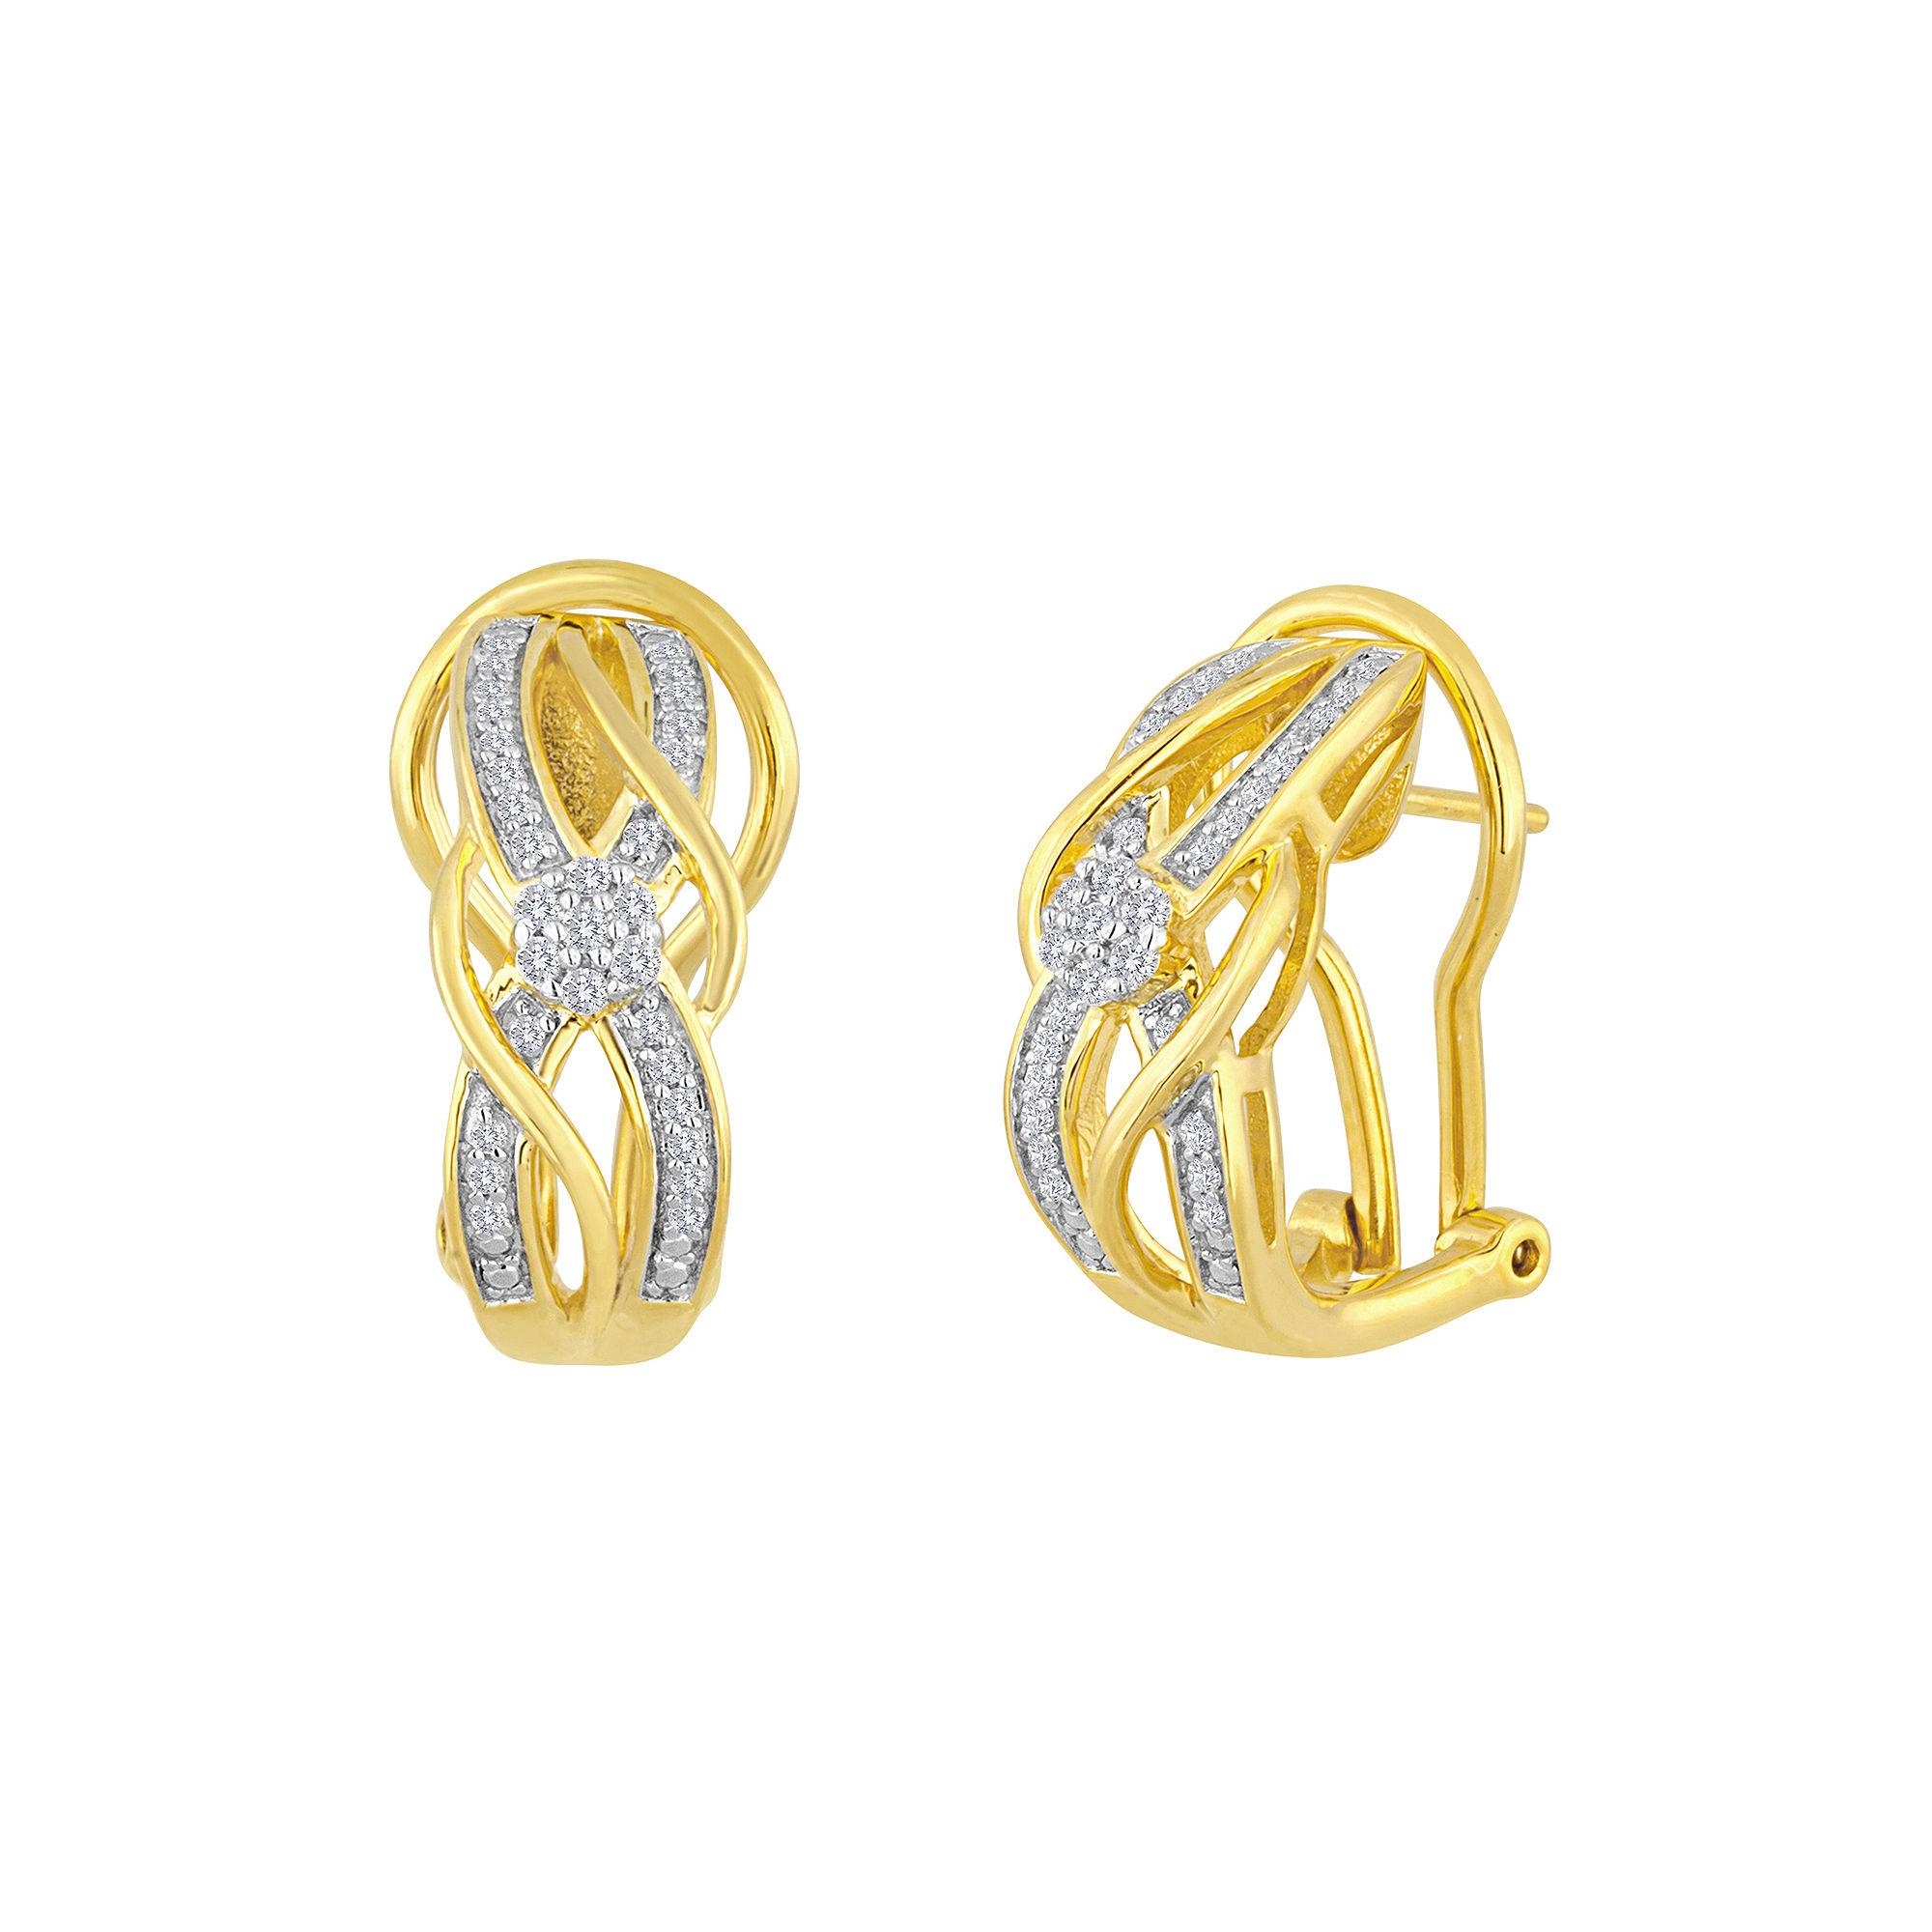 4 Ct Tw Diamond Bypass Earrings Jcpenney